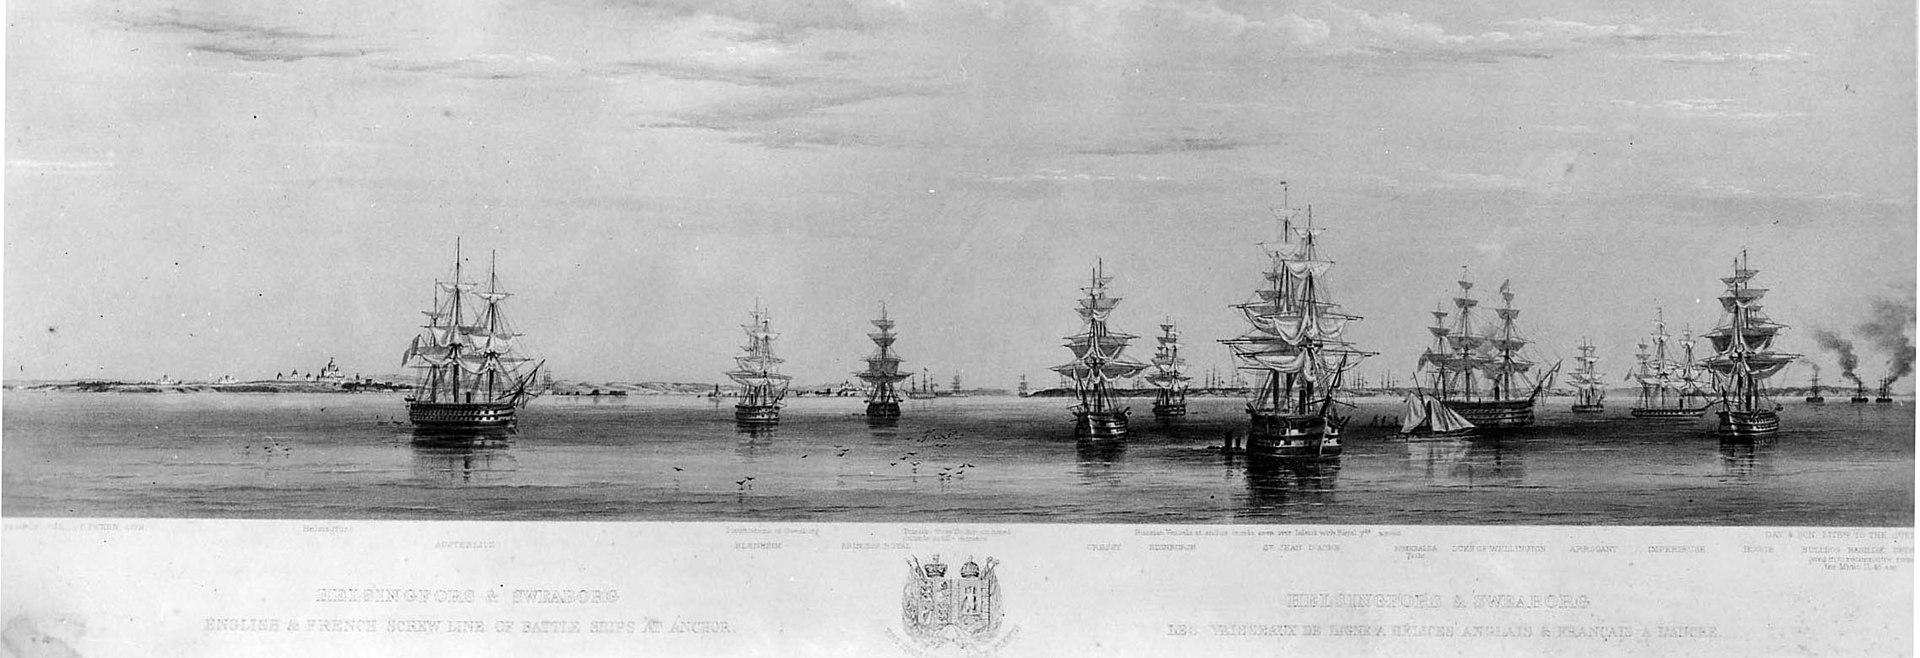 Marinmotiv-Franskengelsk eskader vid Sveaborg 1854 - Исторический музей - O 08128.jpeg